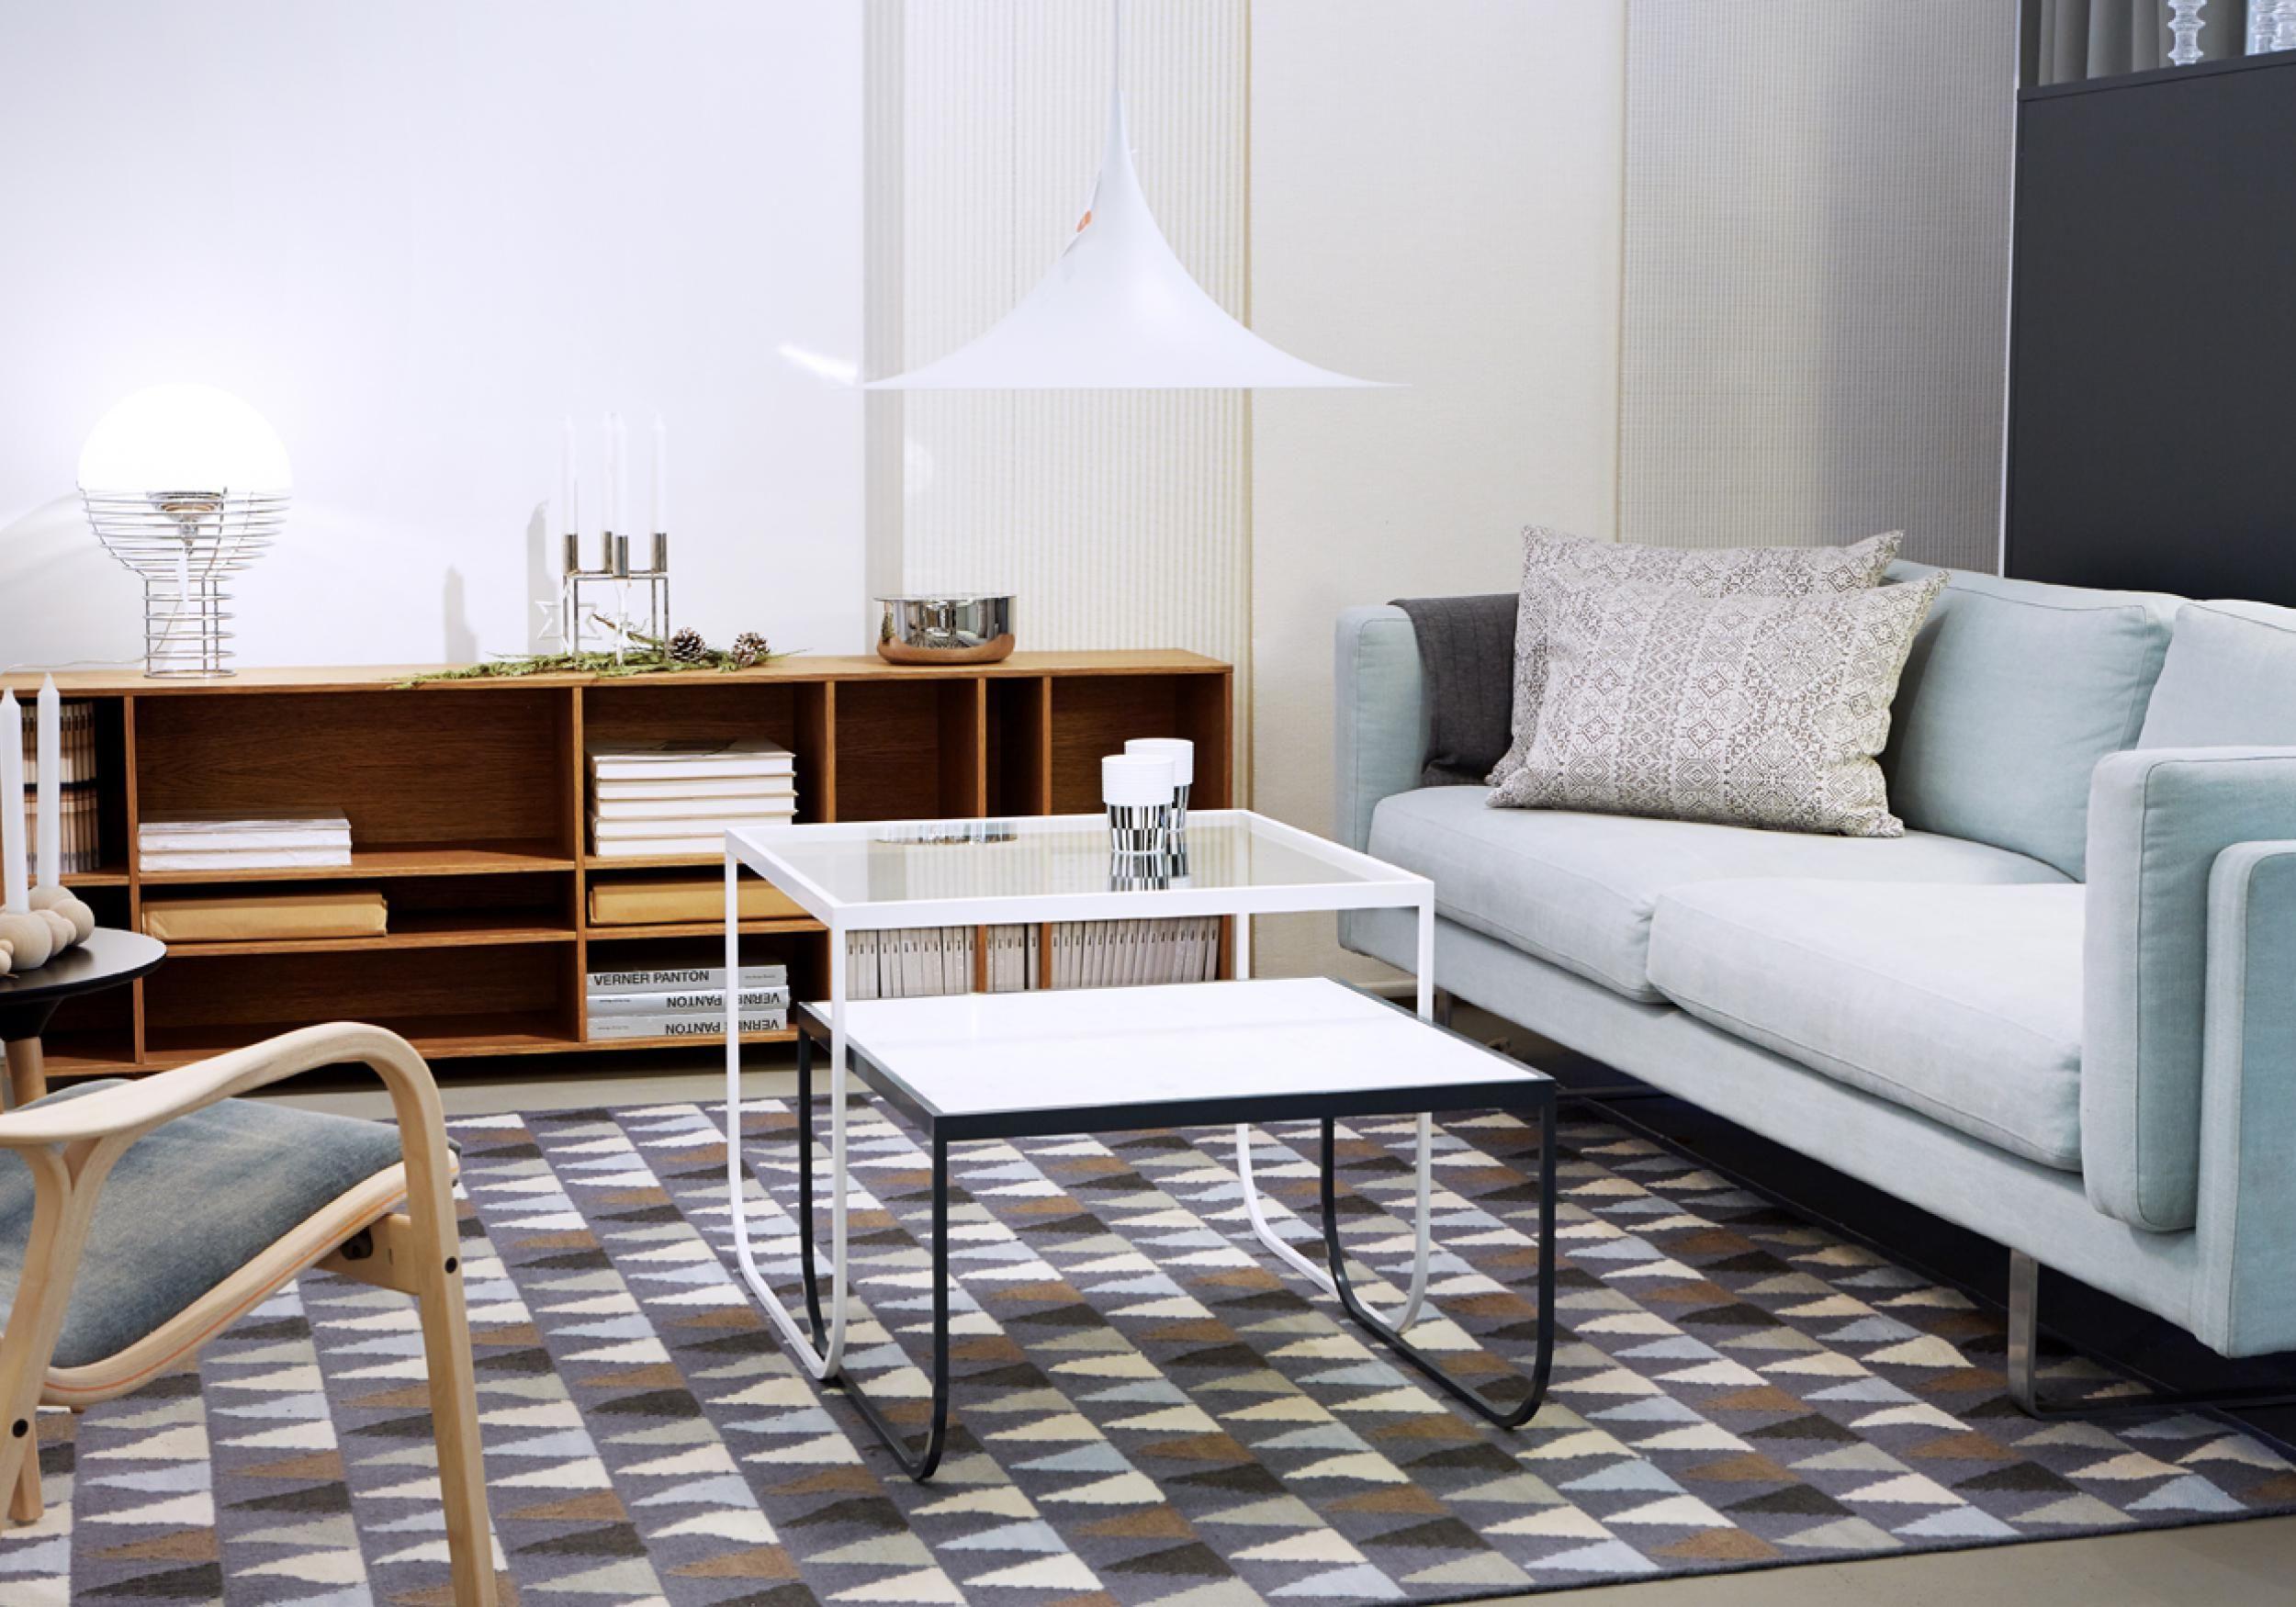 furniture store in zurich interior inspiration scandinavian design nordic interiors